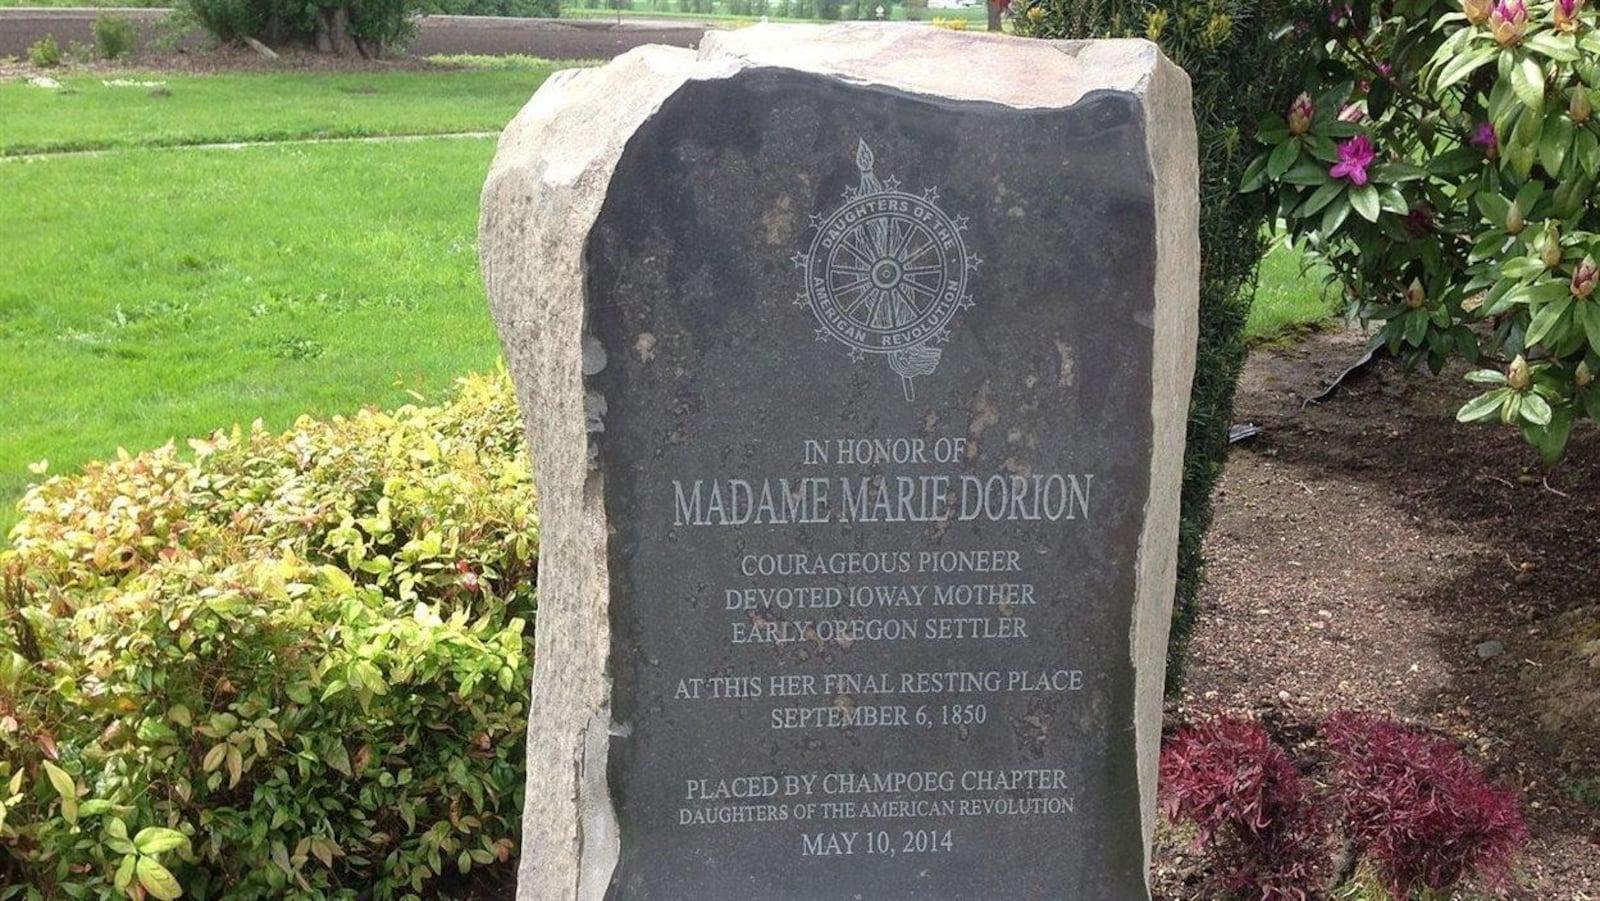 La tombe de Marie Iowa Dorion